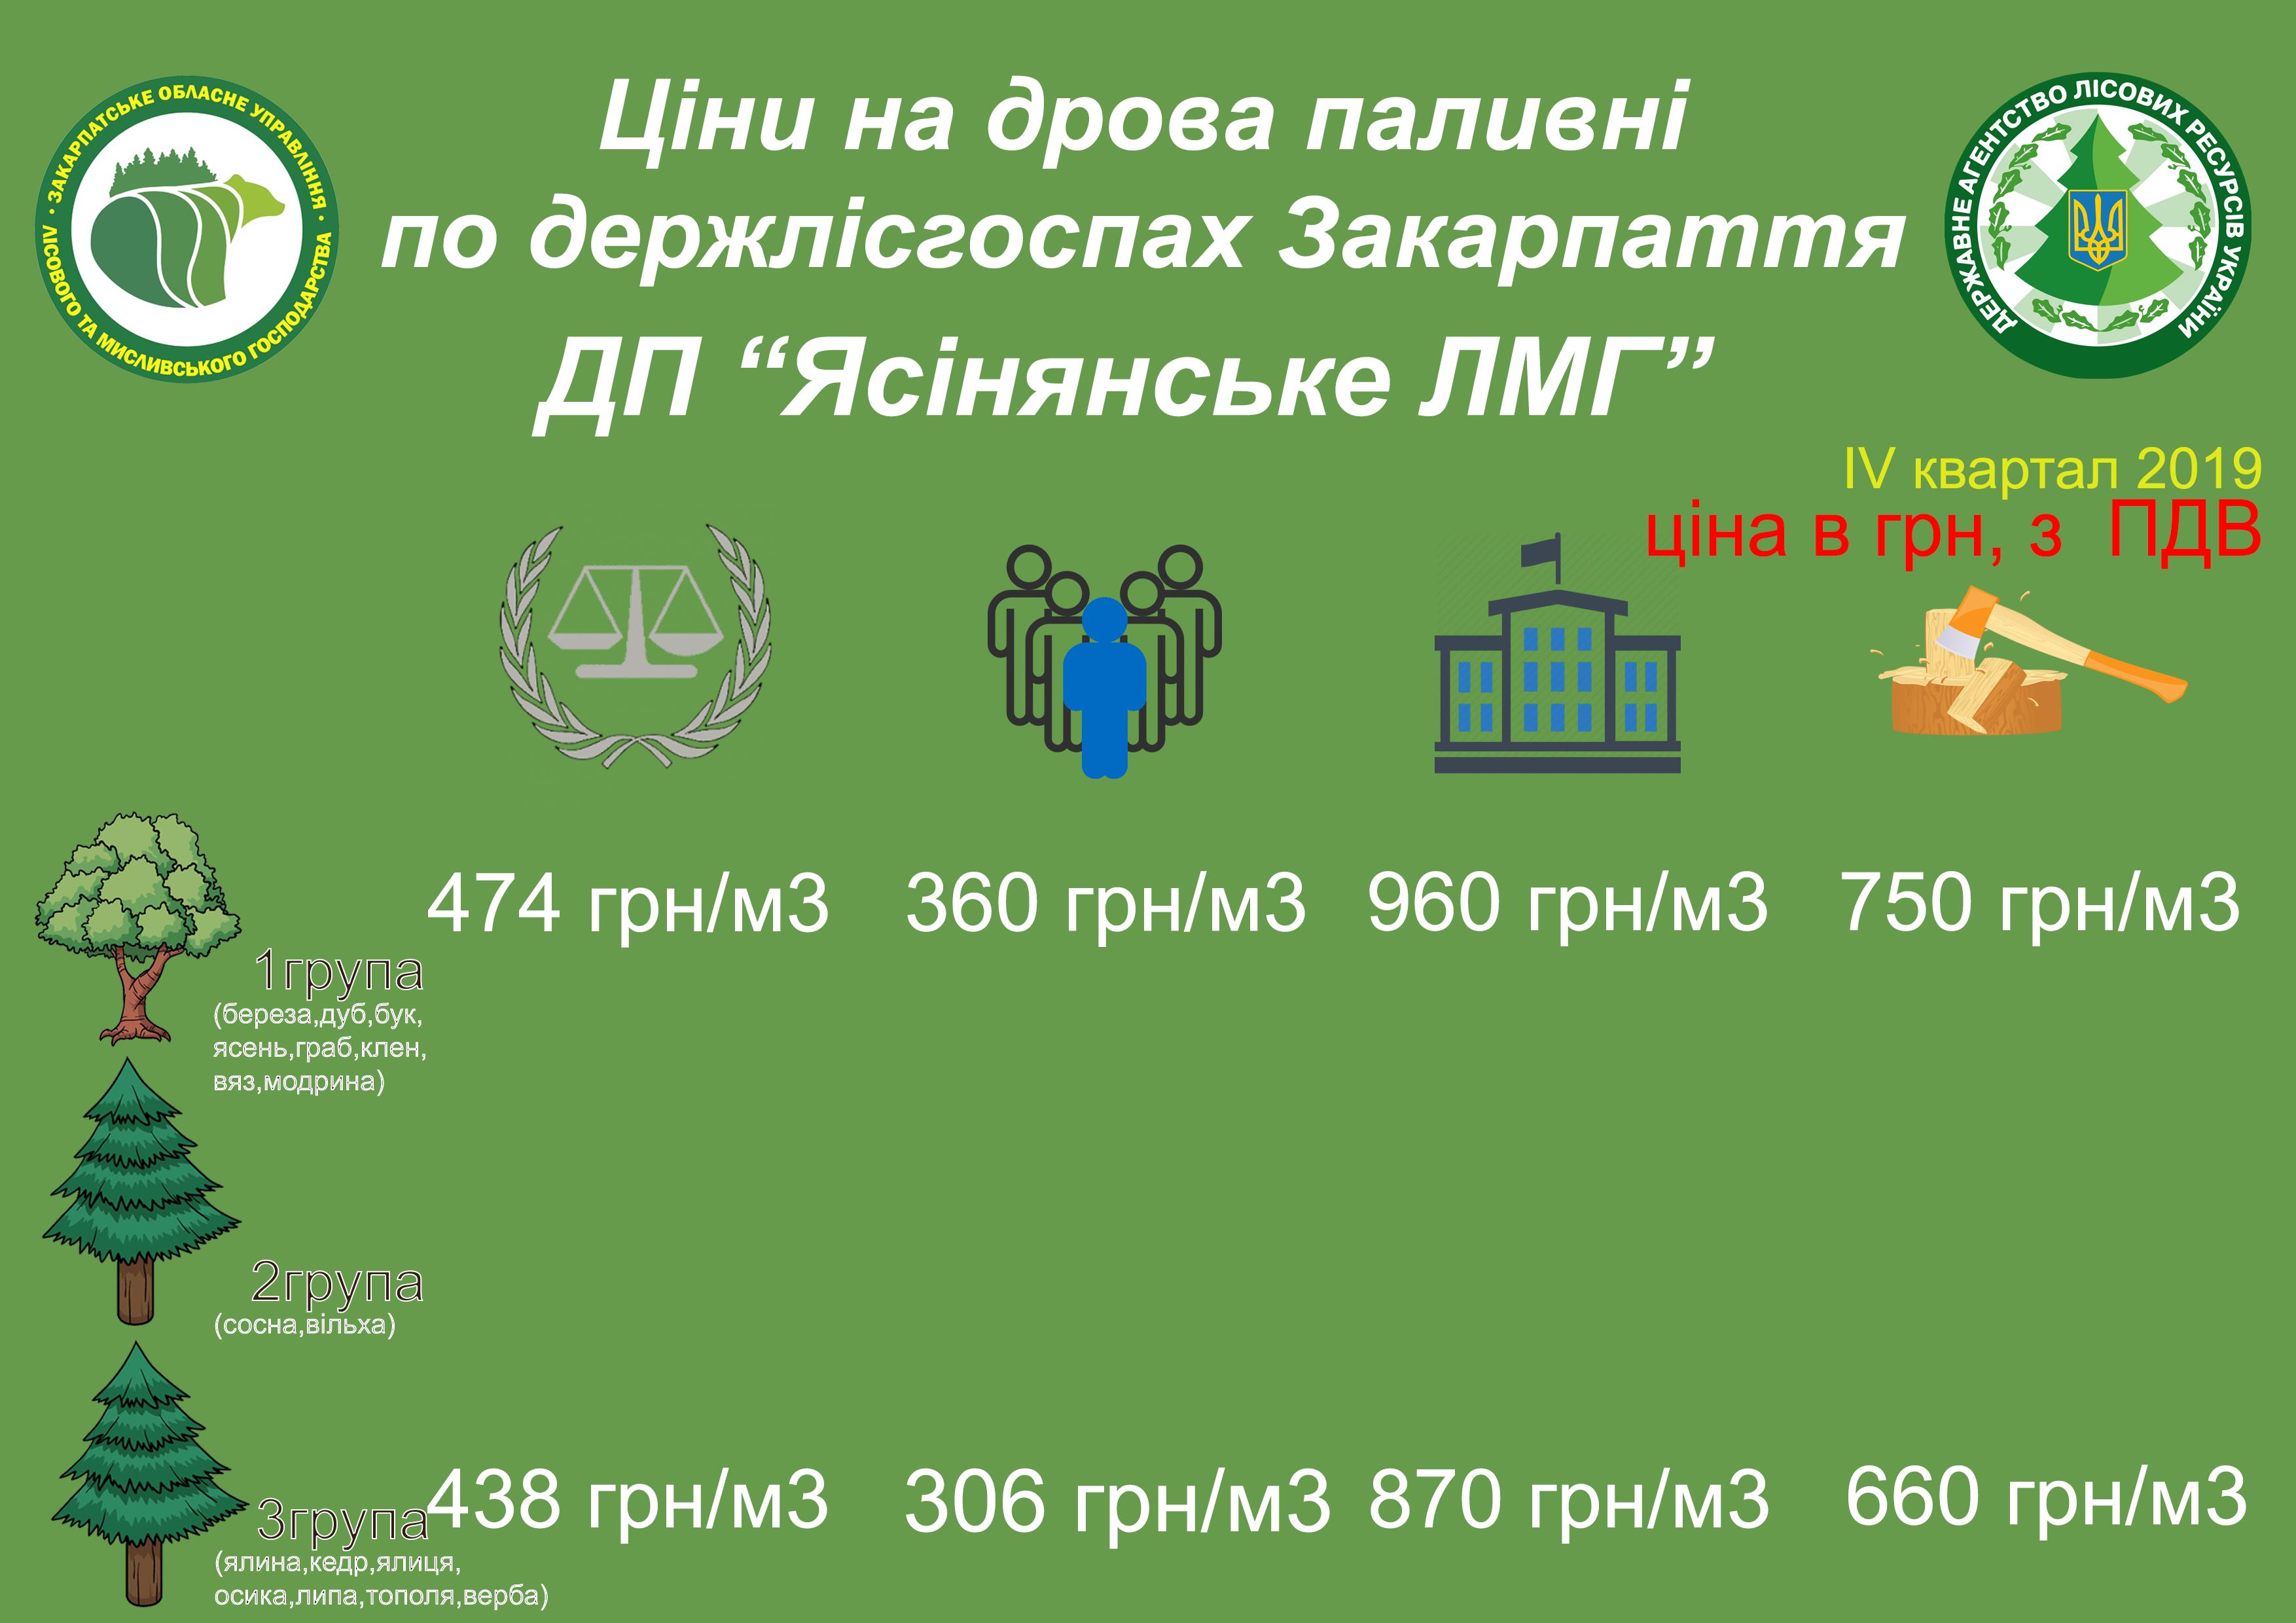 "ДП ""Ясінянське ЛМГ"""